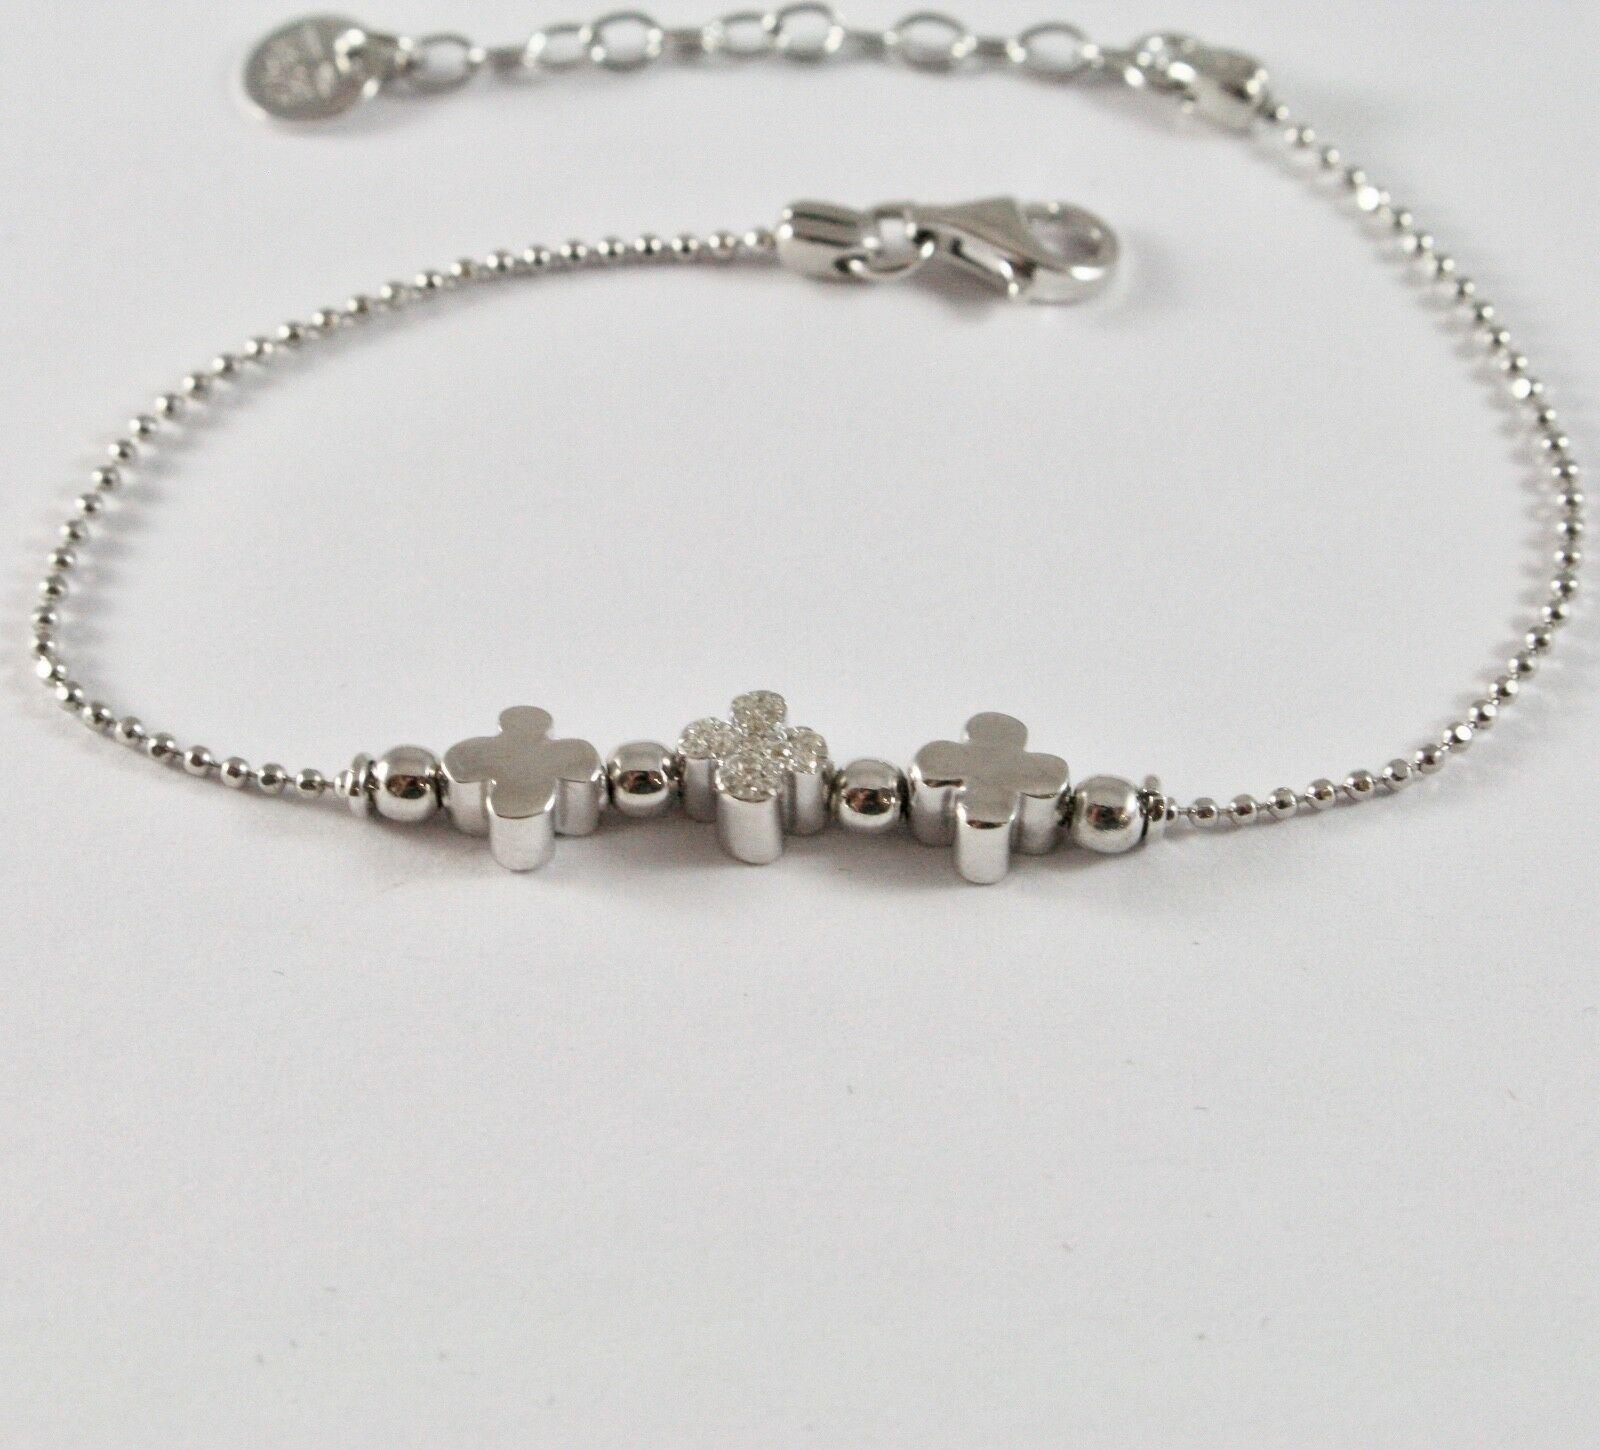 Armband 925 Silber Jack & Co A Flummi mit Kleeblätter mit Zirkonia JCB0782